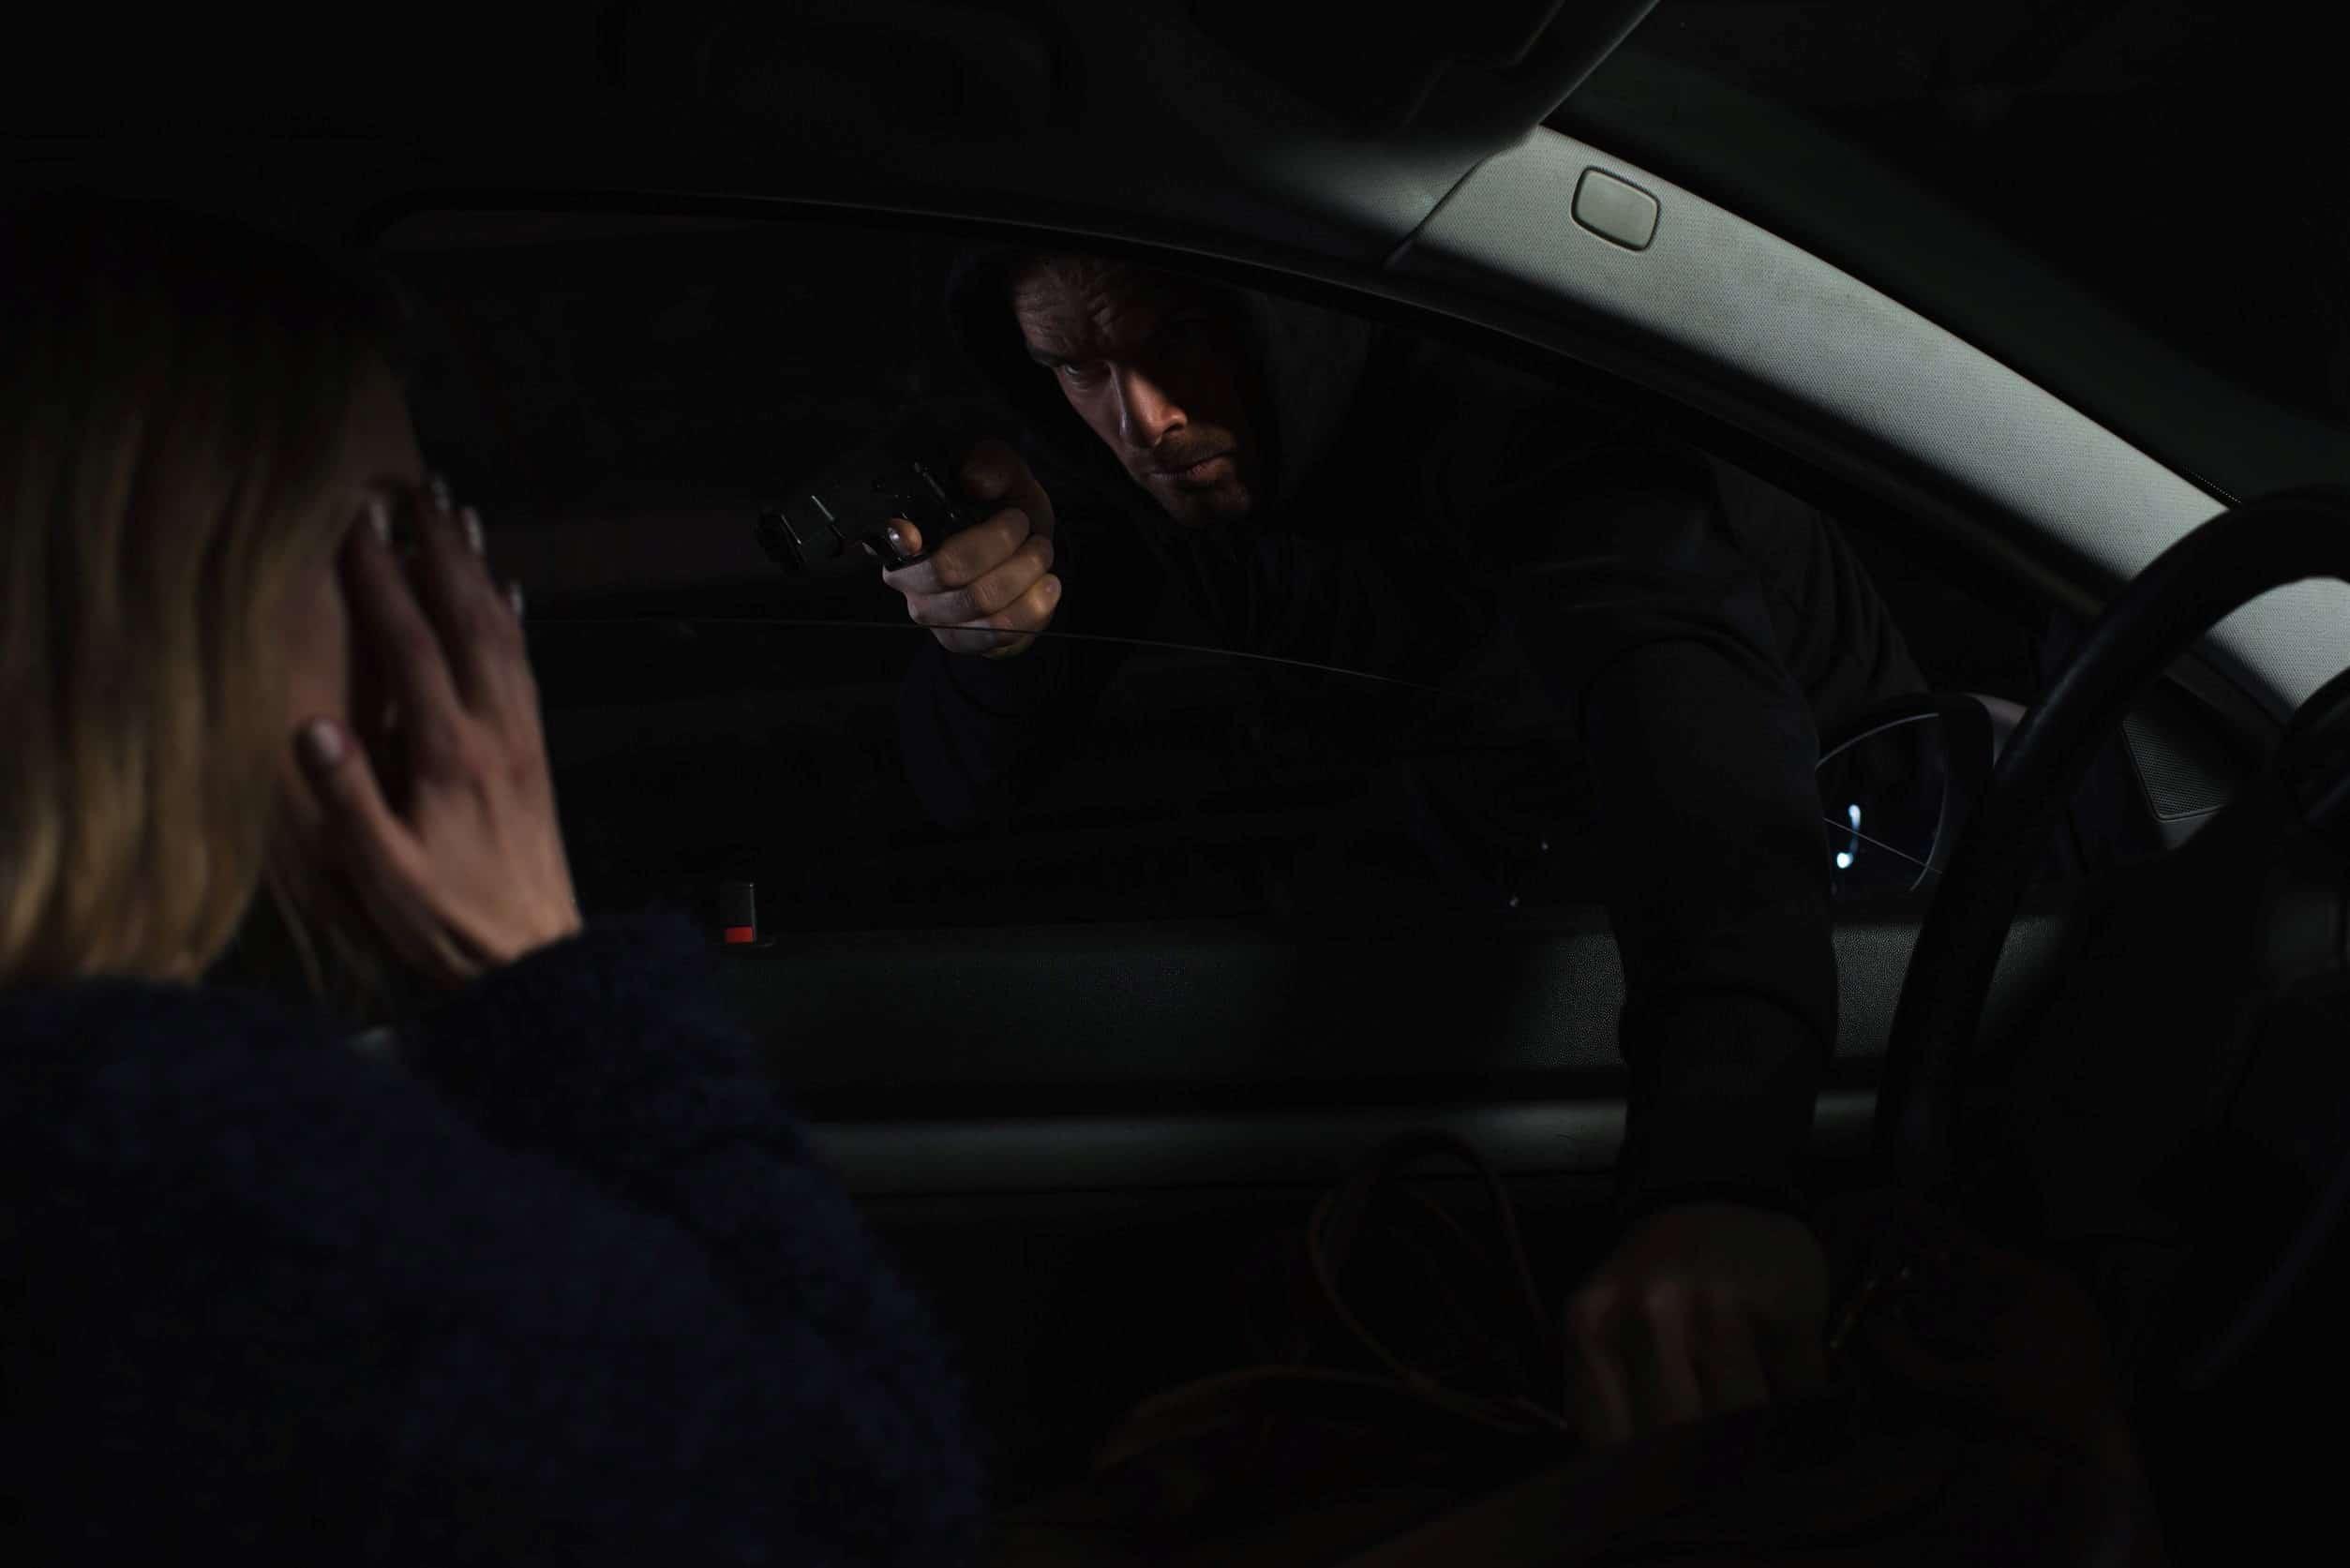 gunpoint robbery